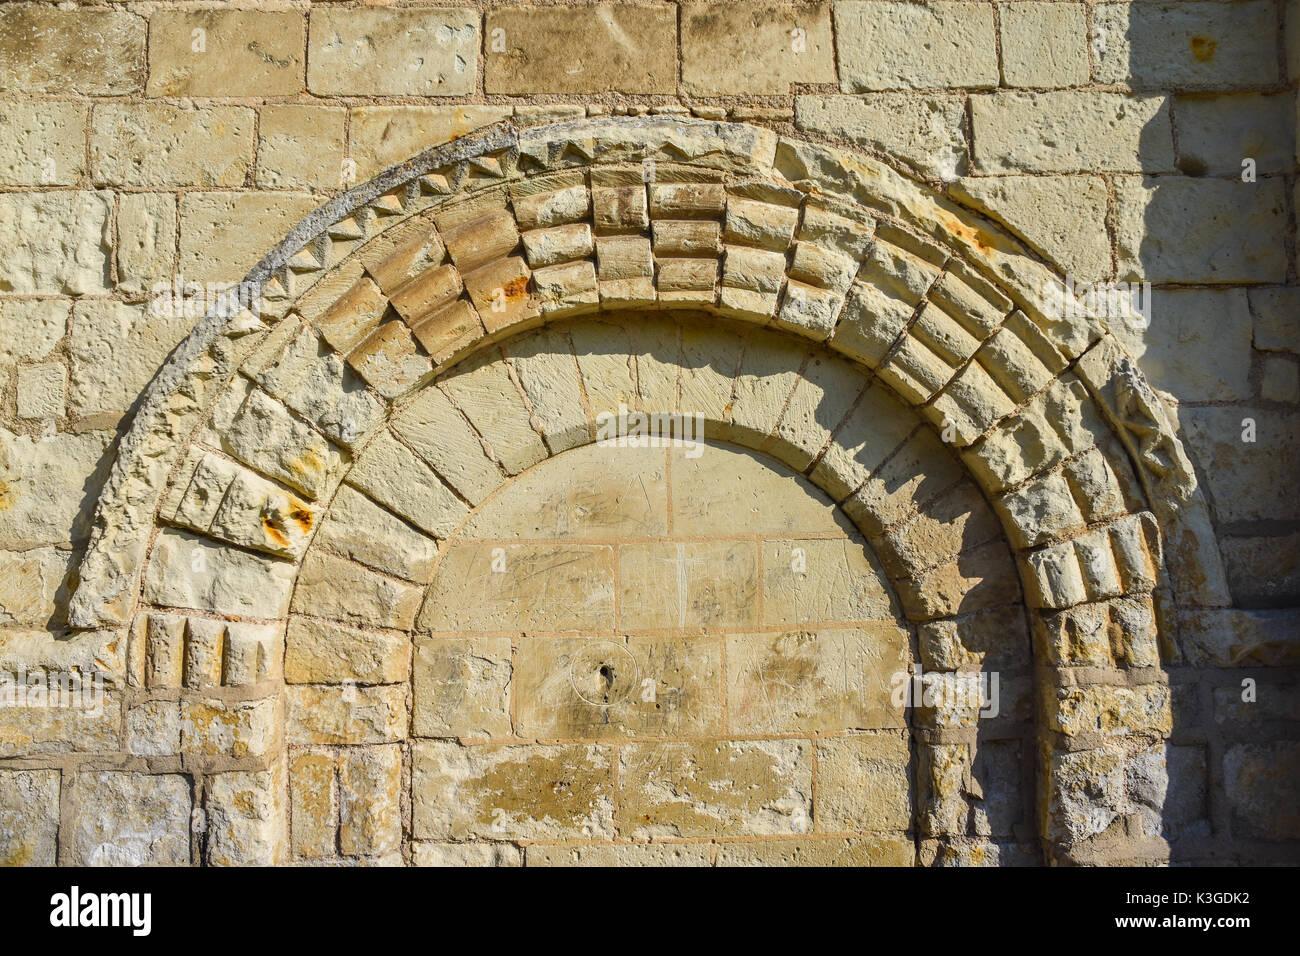 Decorative Stone Arch Stock Photos & Decorative Stone Arch Stock ...